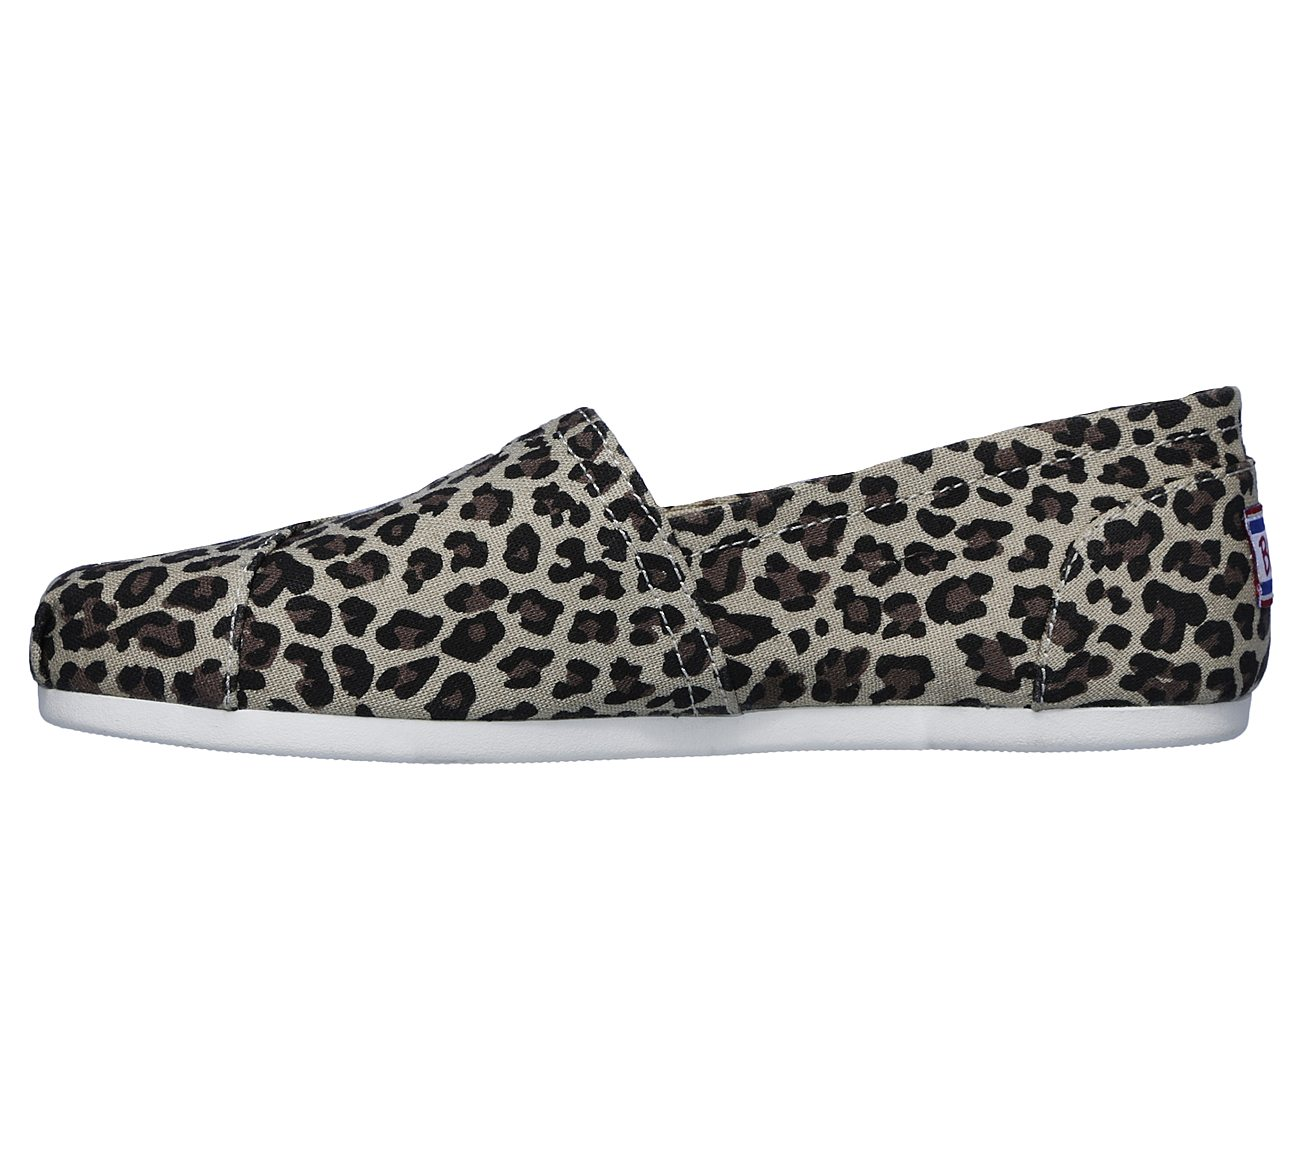 d6c340de4fd5 Buy SKECHERS BOBS Plush - Hot Spotted BOBS Shoes only  42.00